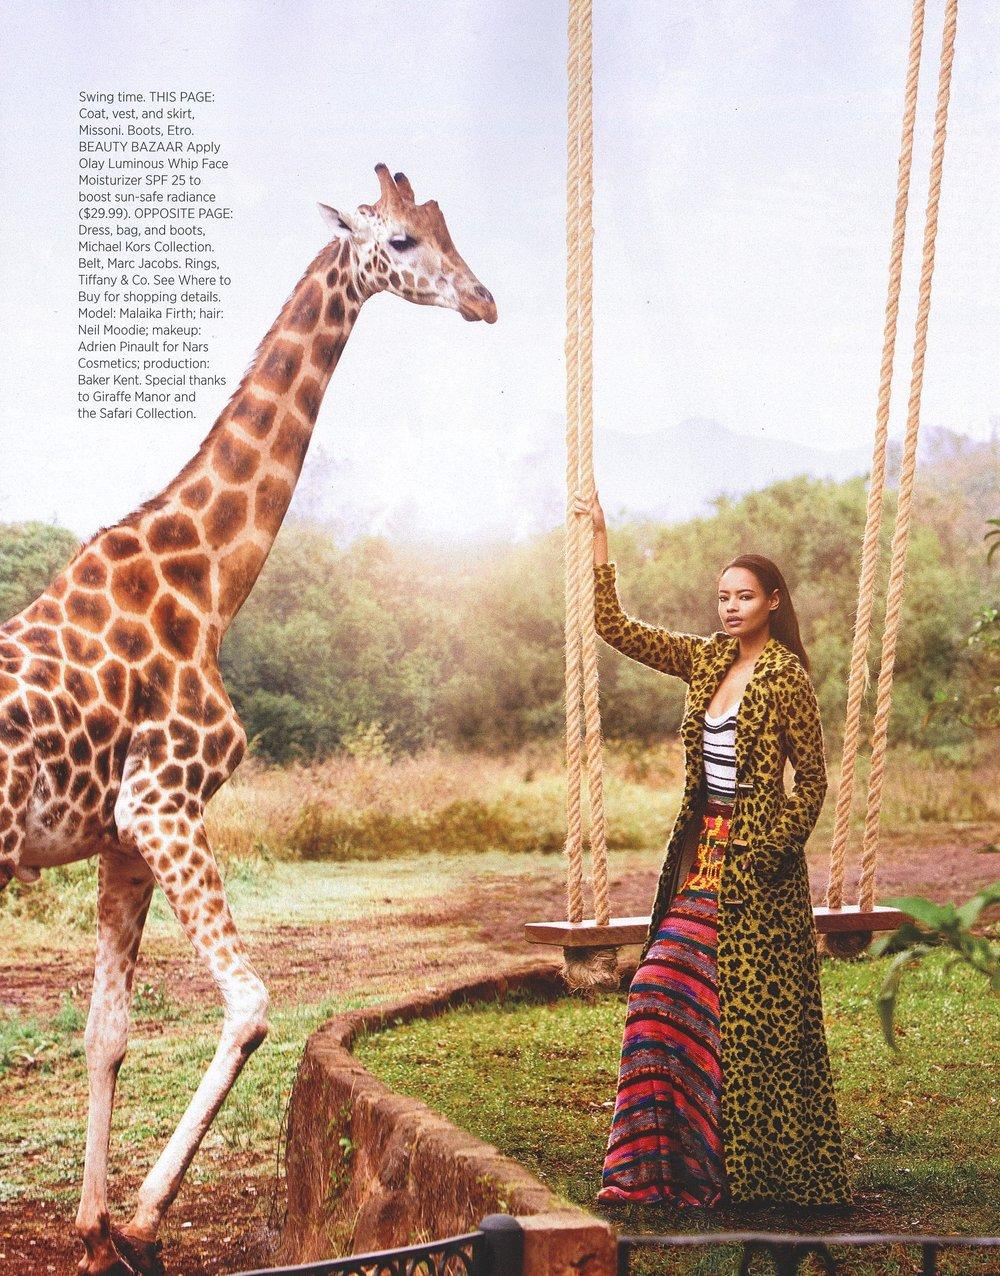 Harper's Bazaar August 2018 pg 126.jpg